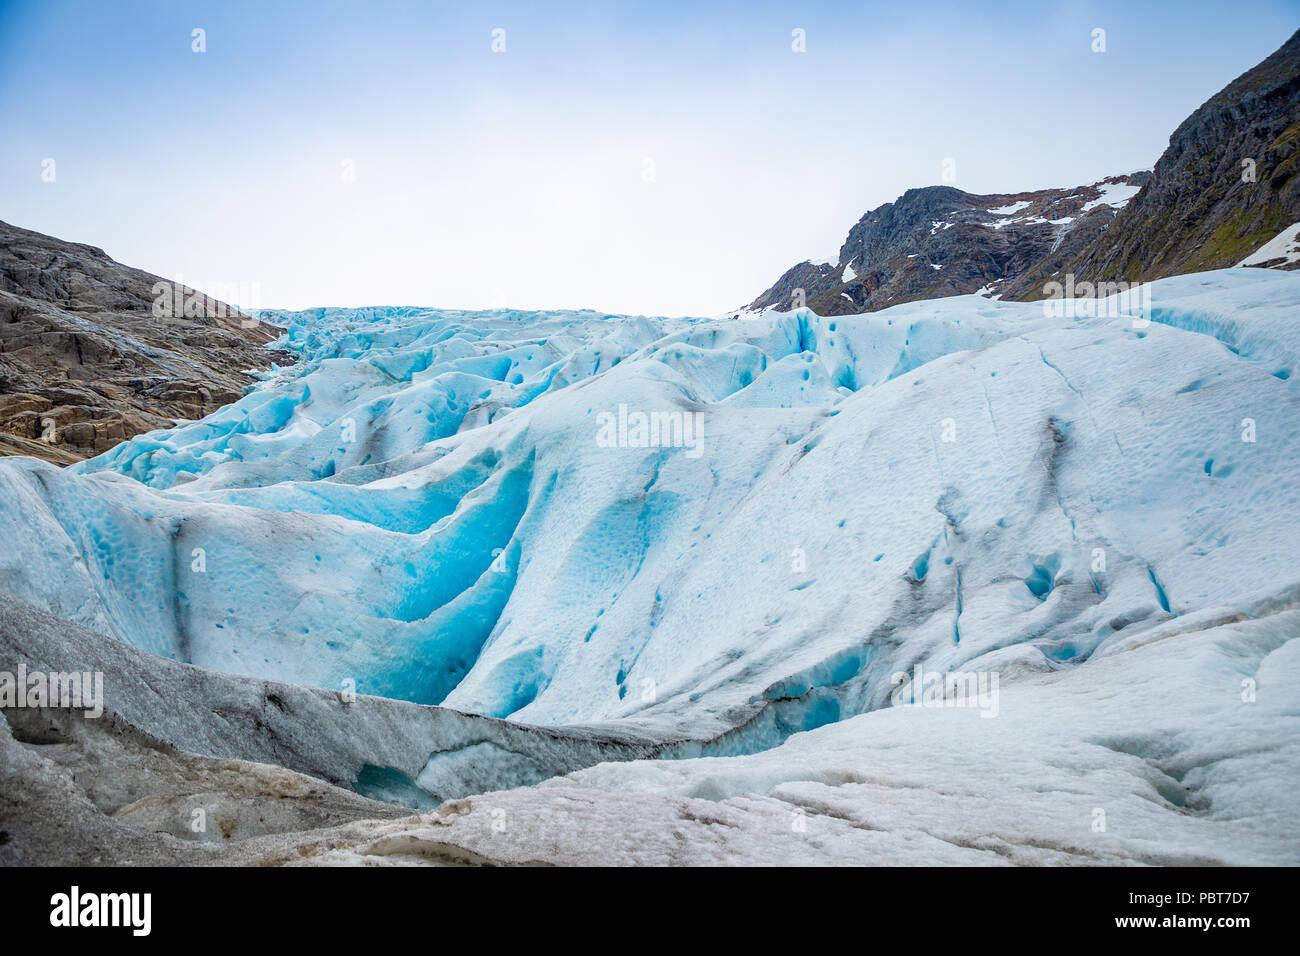 Part of Svartisen Glacier in Norway - Stock Image